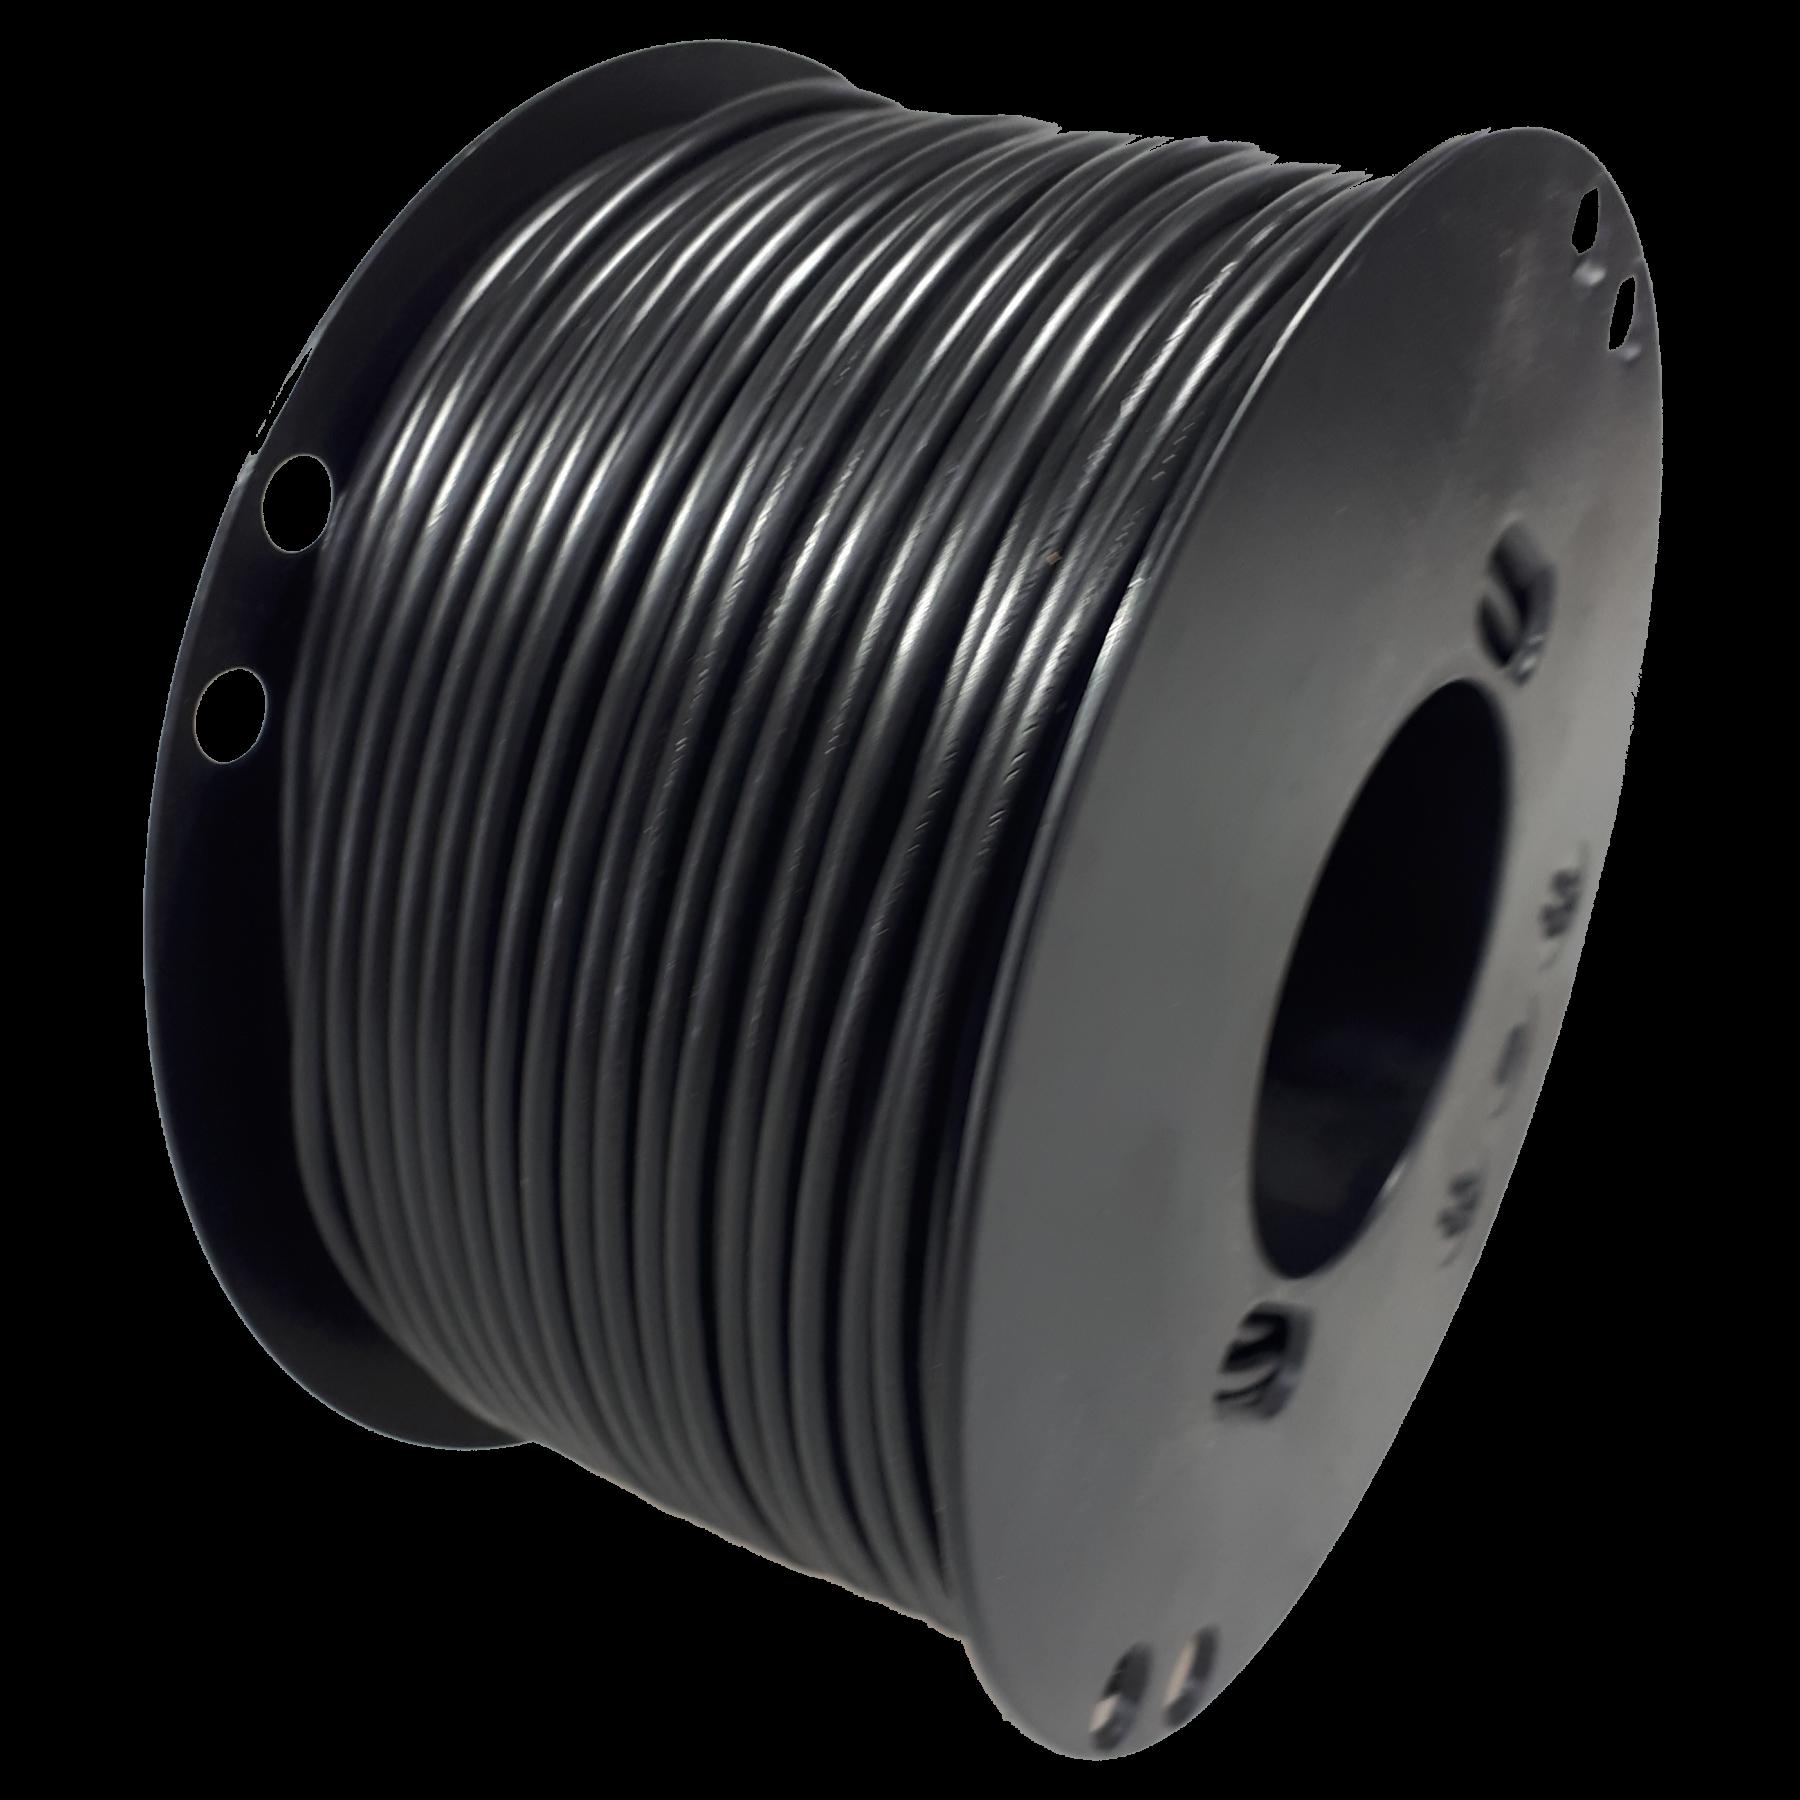 Kabel 6mmq zwart 50m haspel